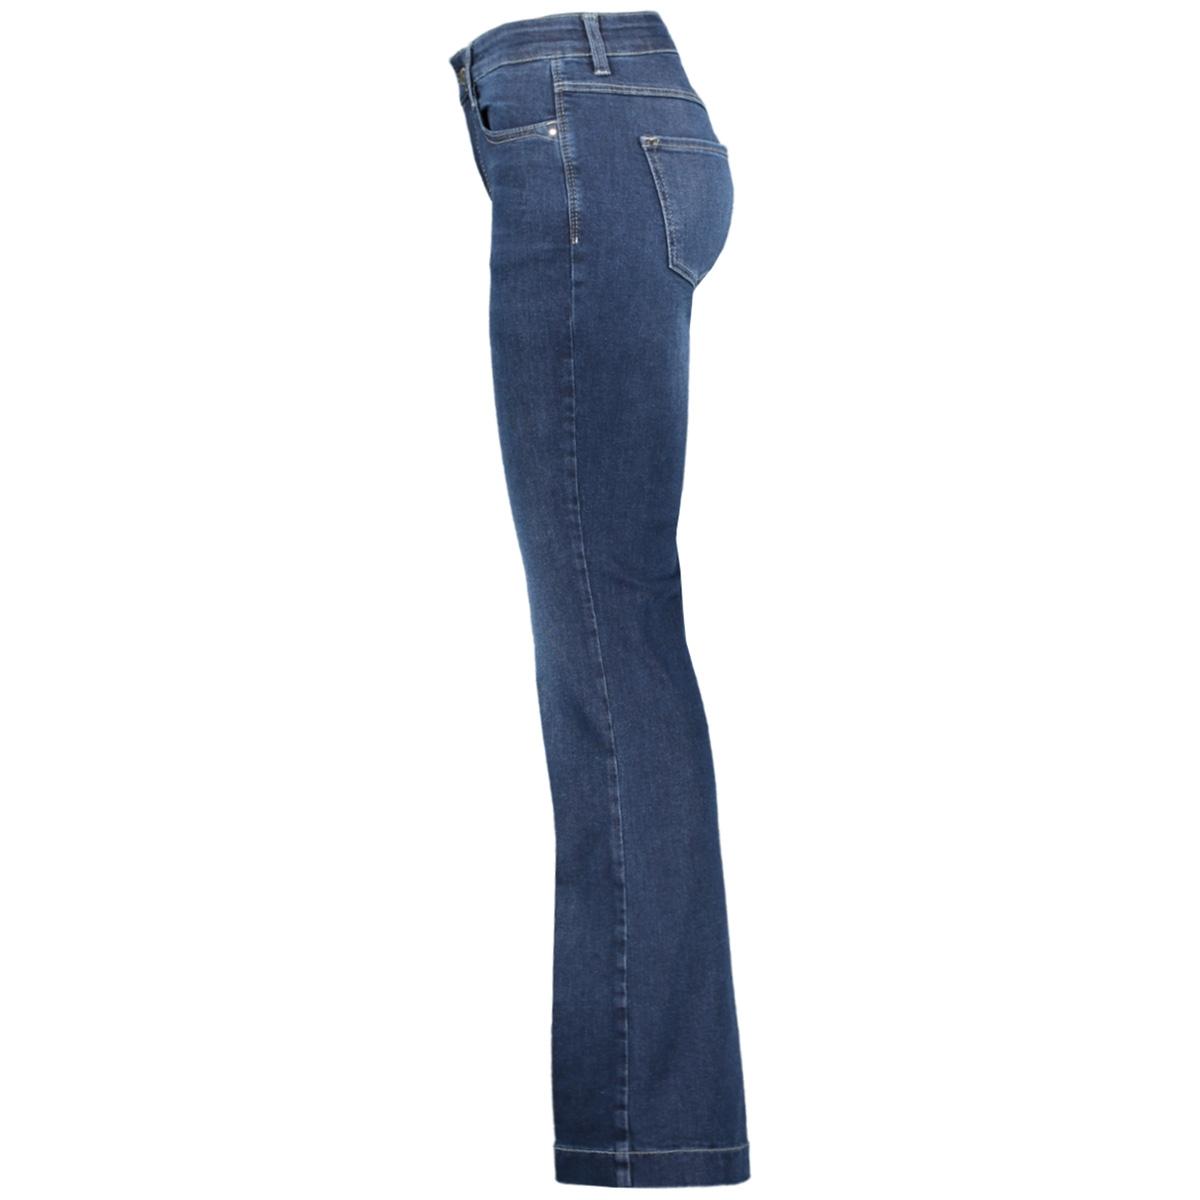 dream boot 5428 90 0355 mac jeans d853 dark used